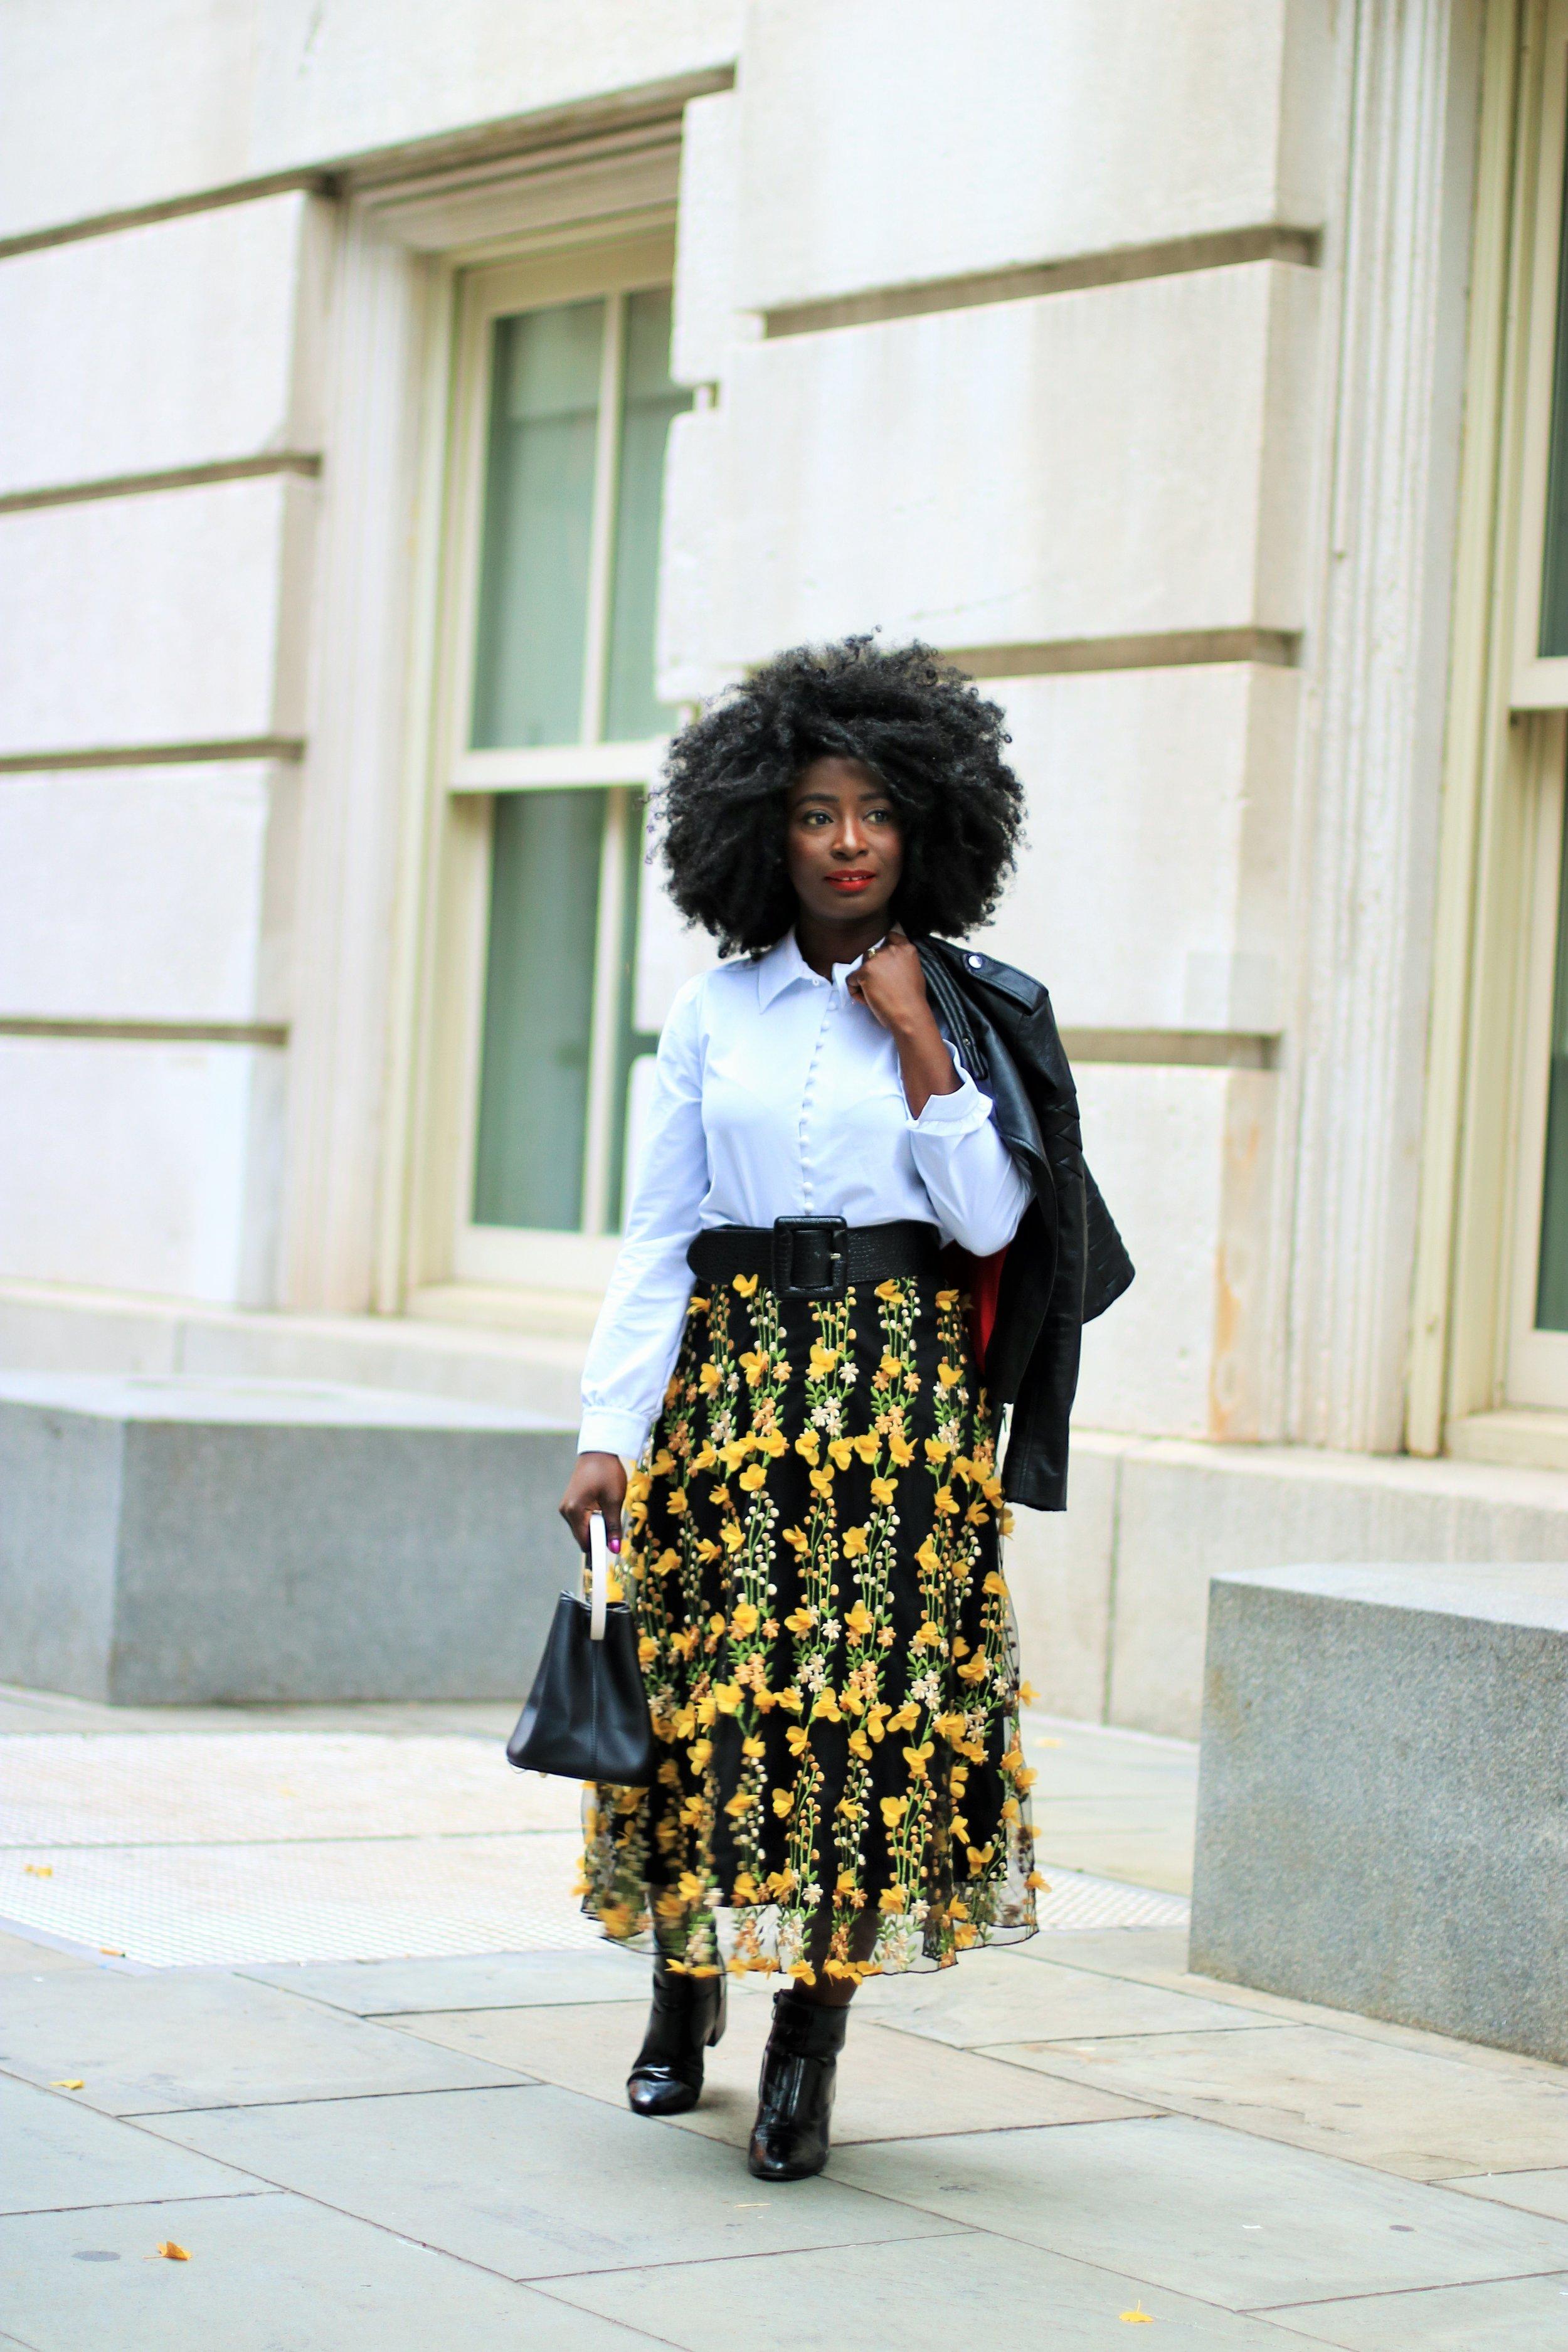 Midi-Skirt-Fall-Outfit-Ideas